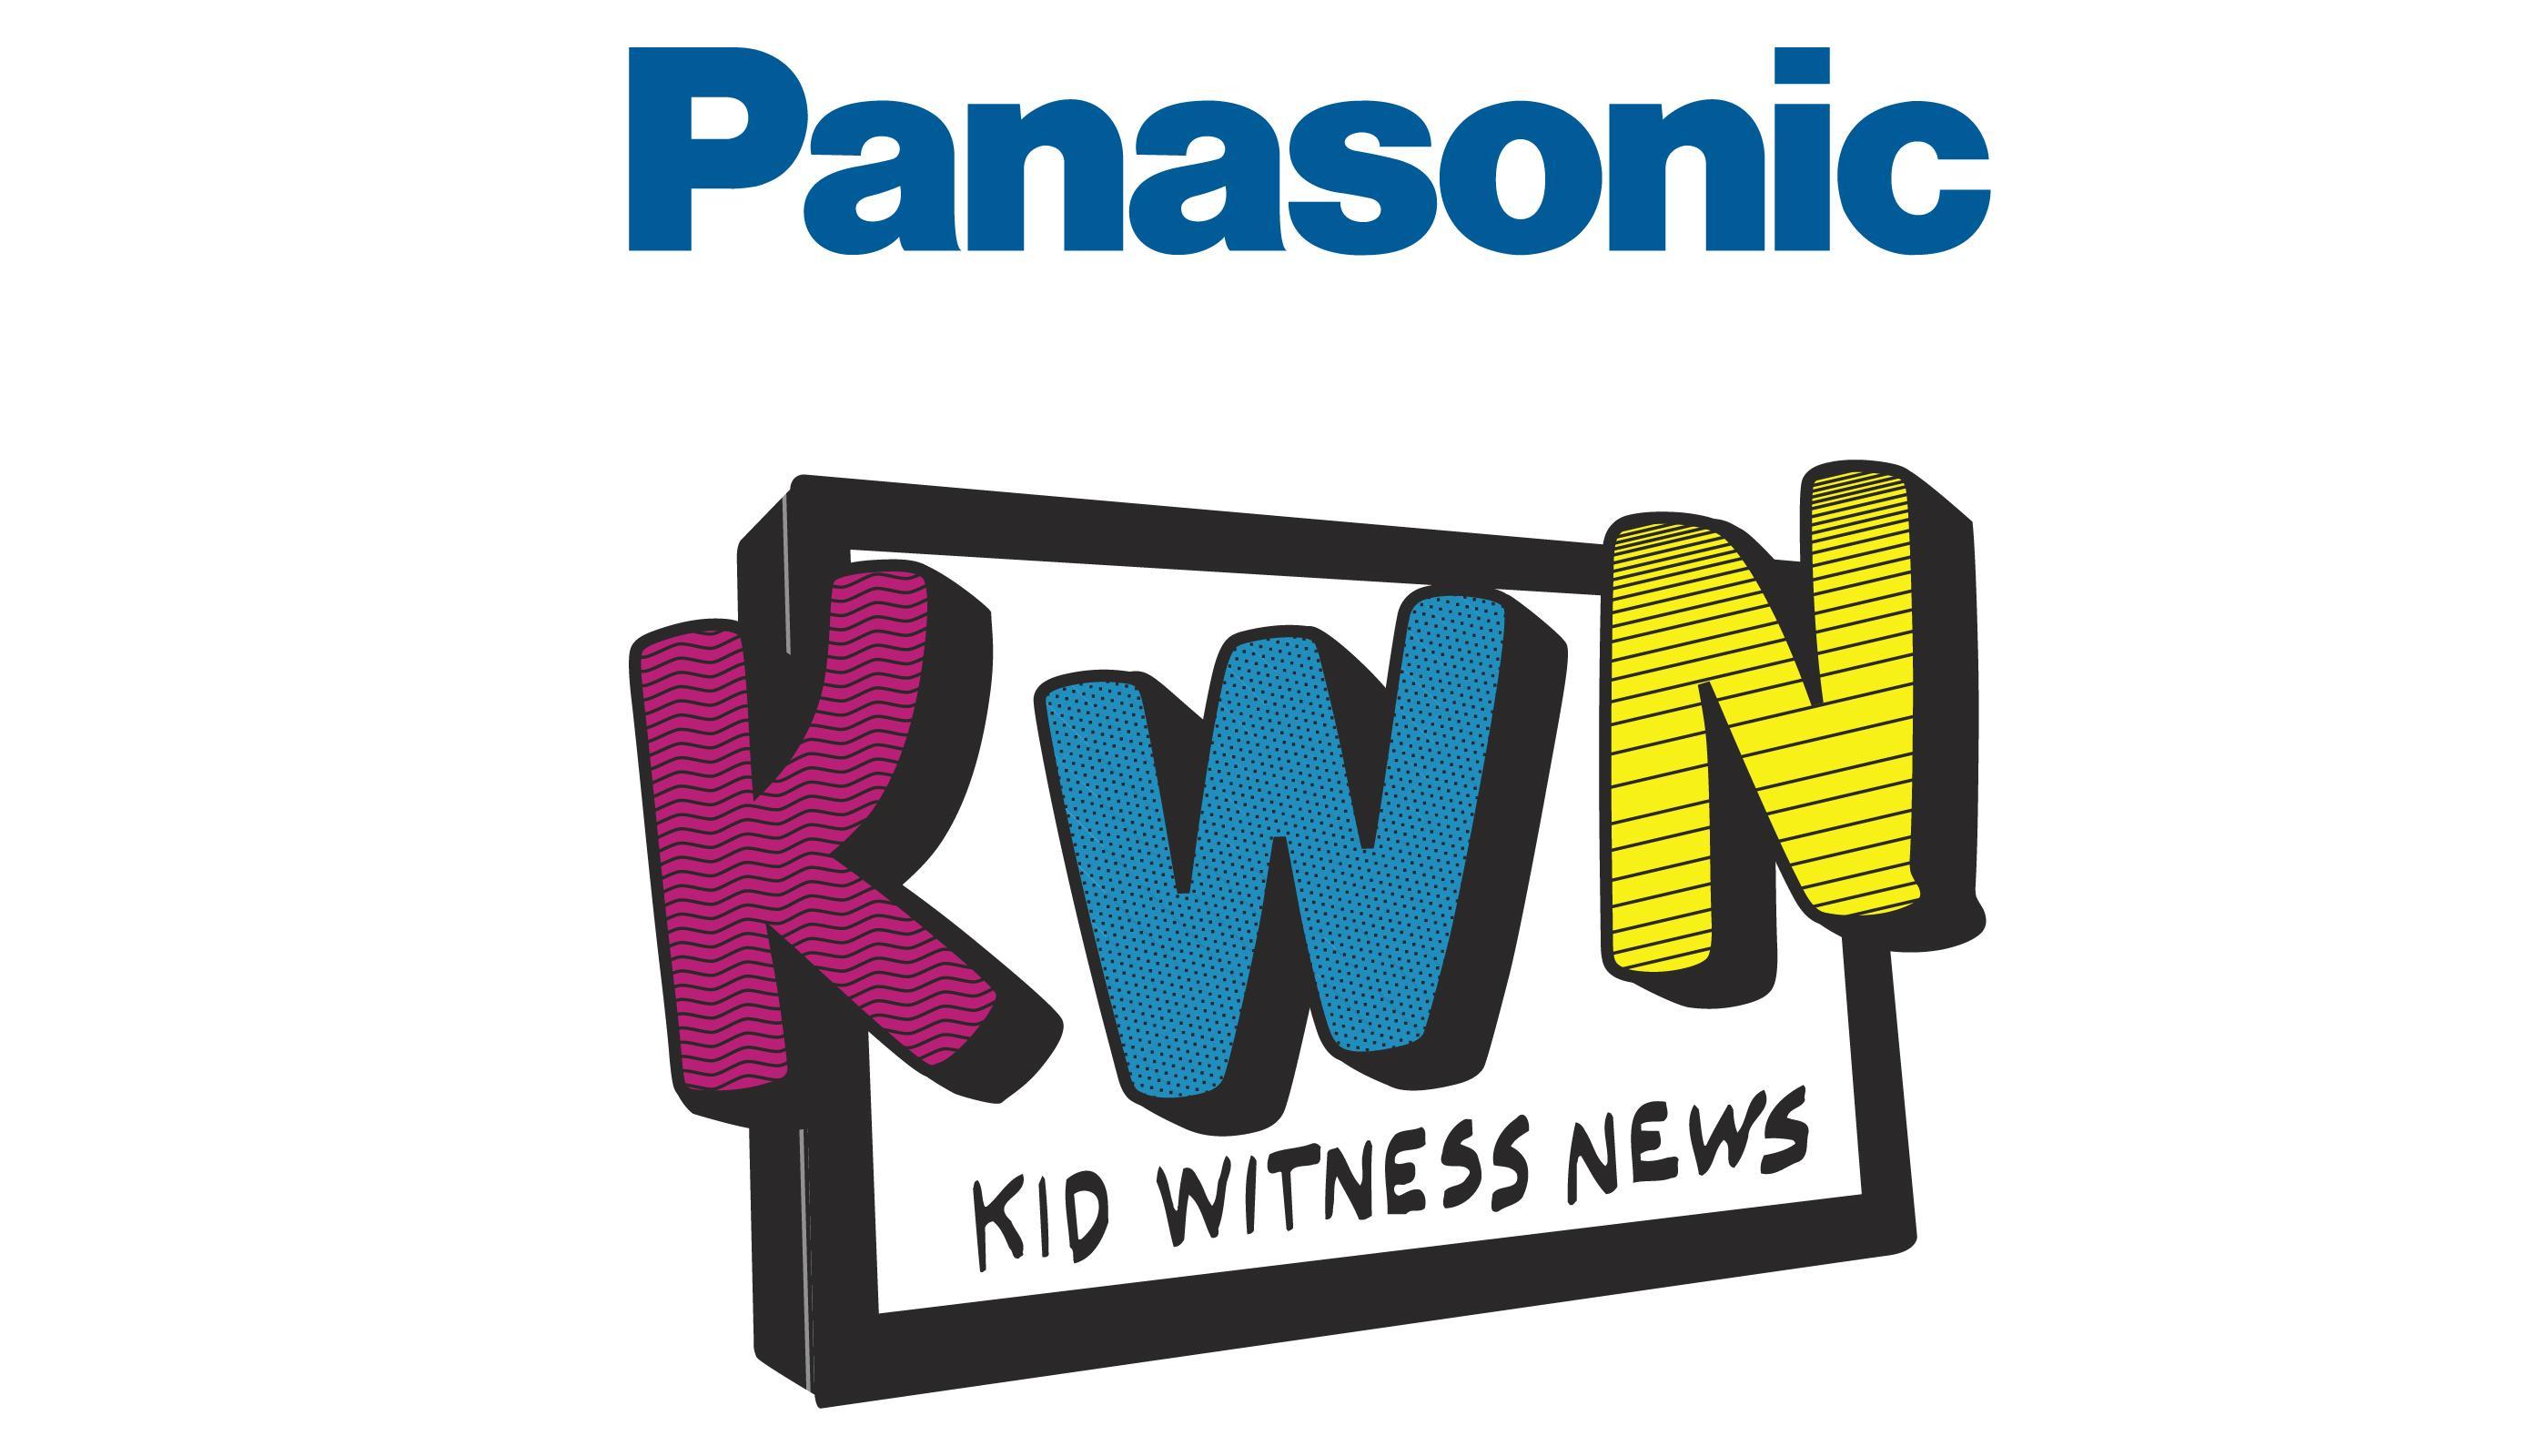 logo: Kid Witness News